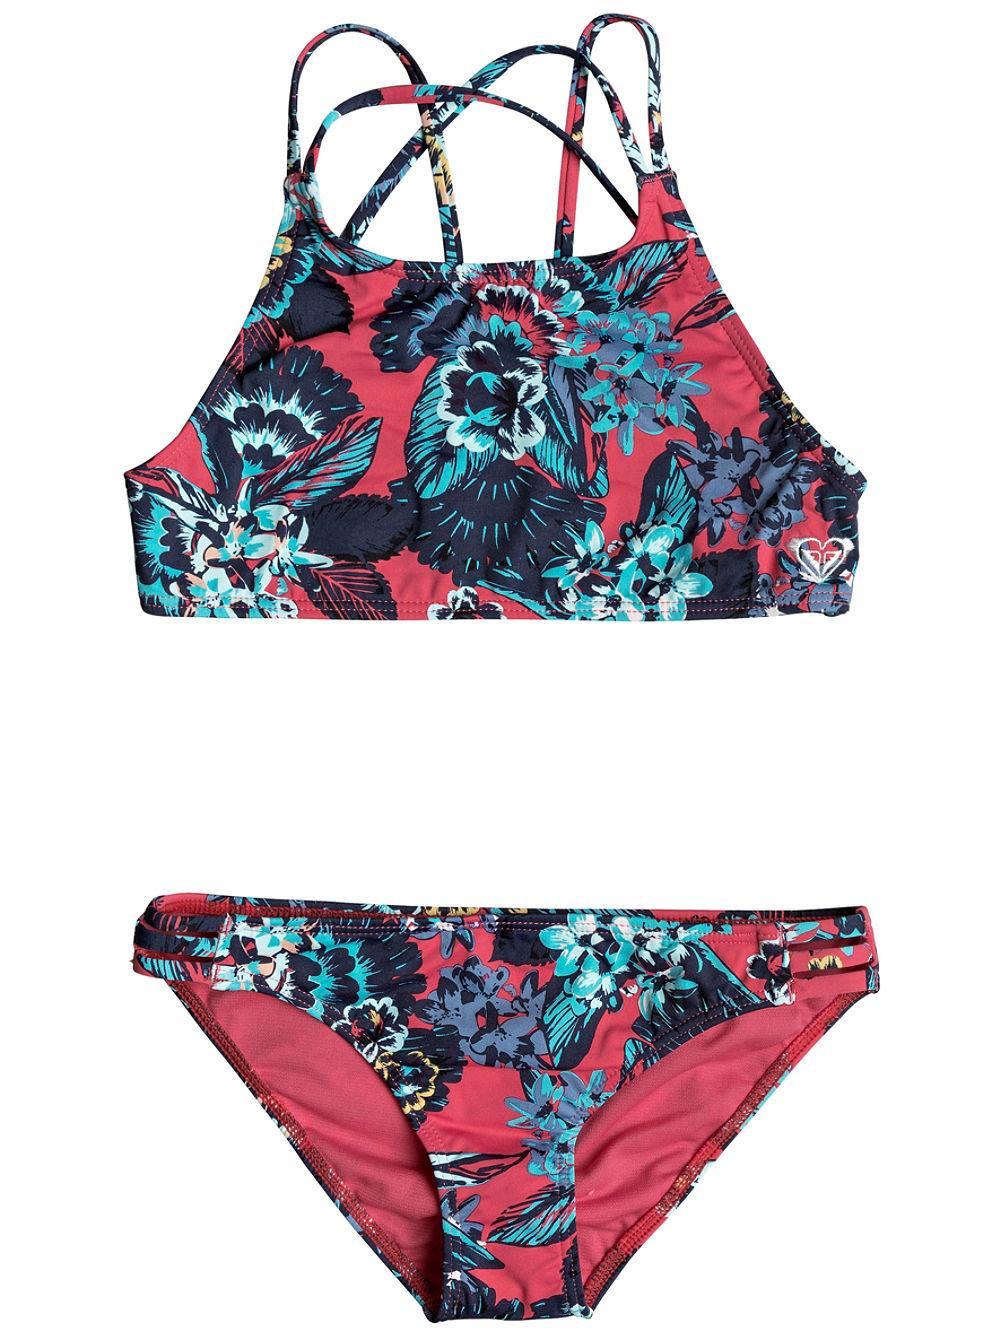 Köp Roxy Let The Surf Crop Top Set Bikini flicka online på blue-tomato.com ef50227e0112e